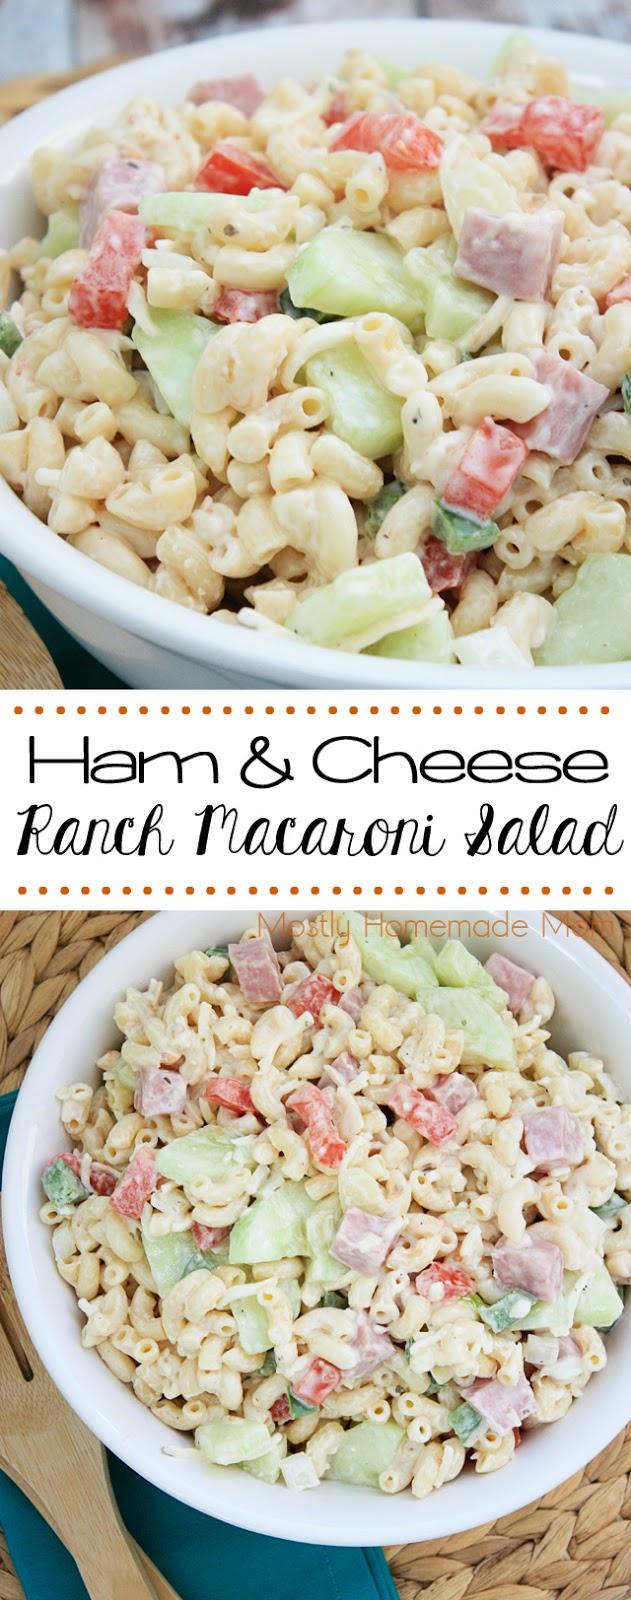 Ham and Cheese Ranch Macaroni Salad